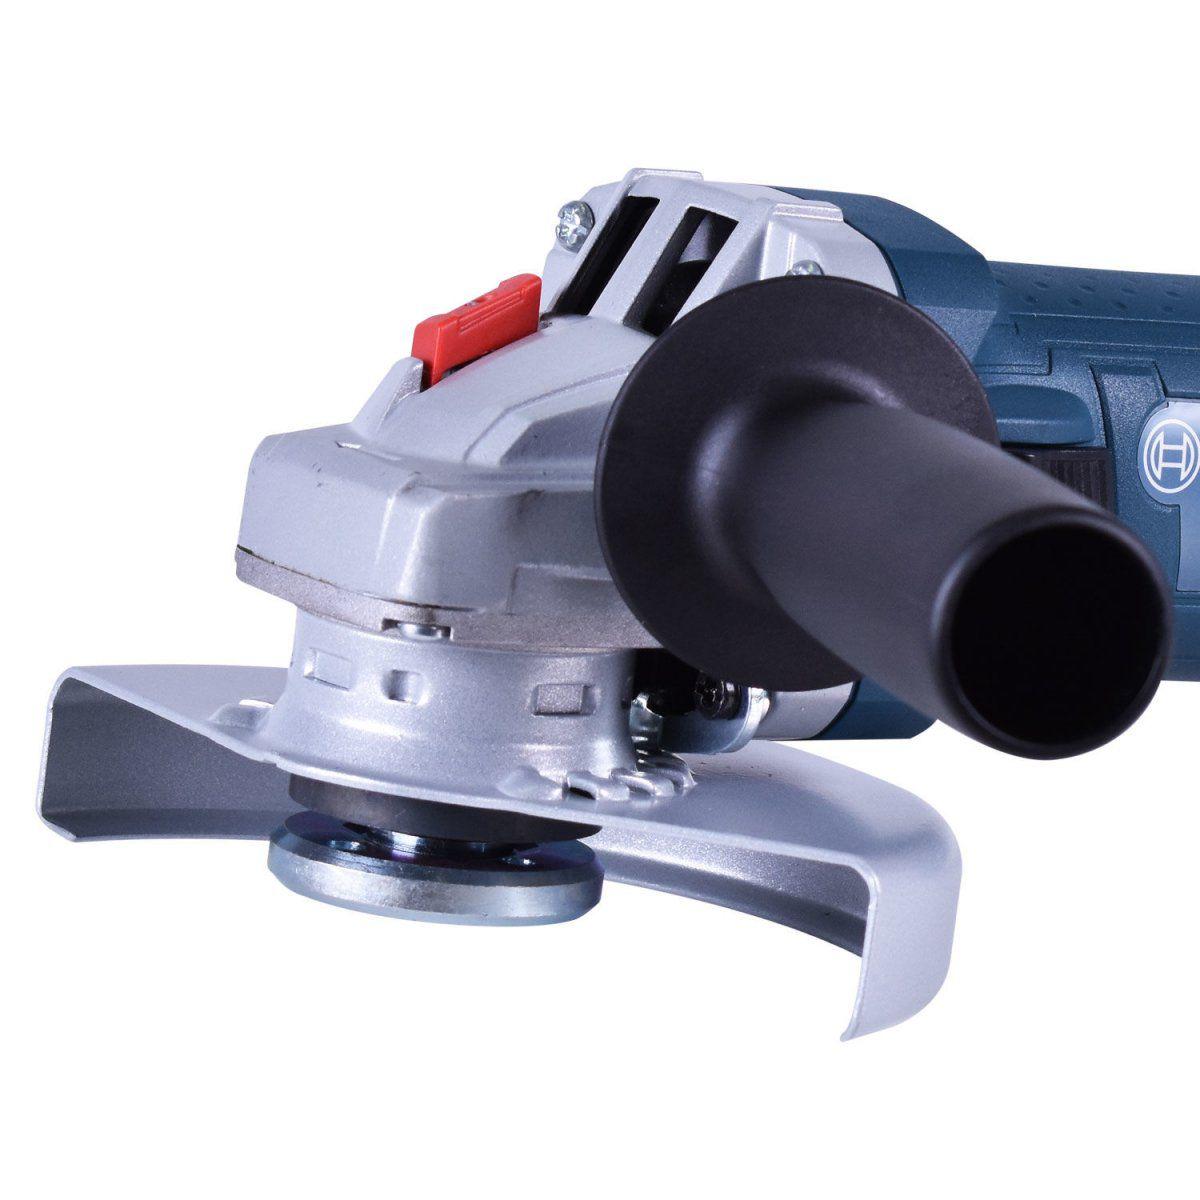 Esmerilhadeira Angular GWS 9-125 S – Bosch